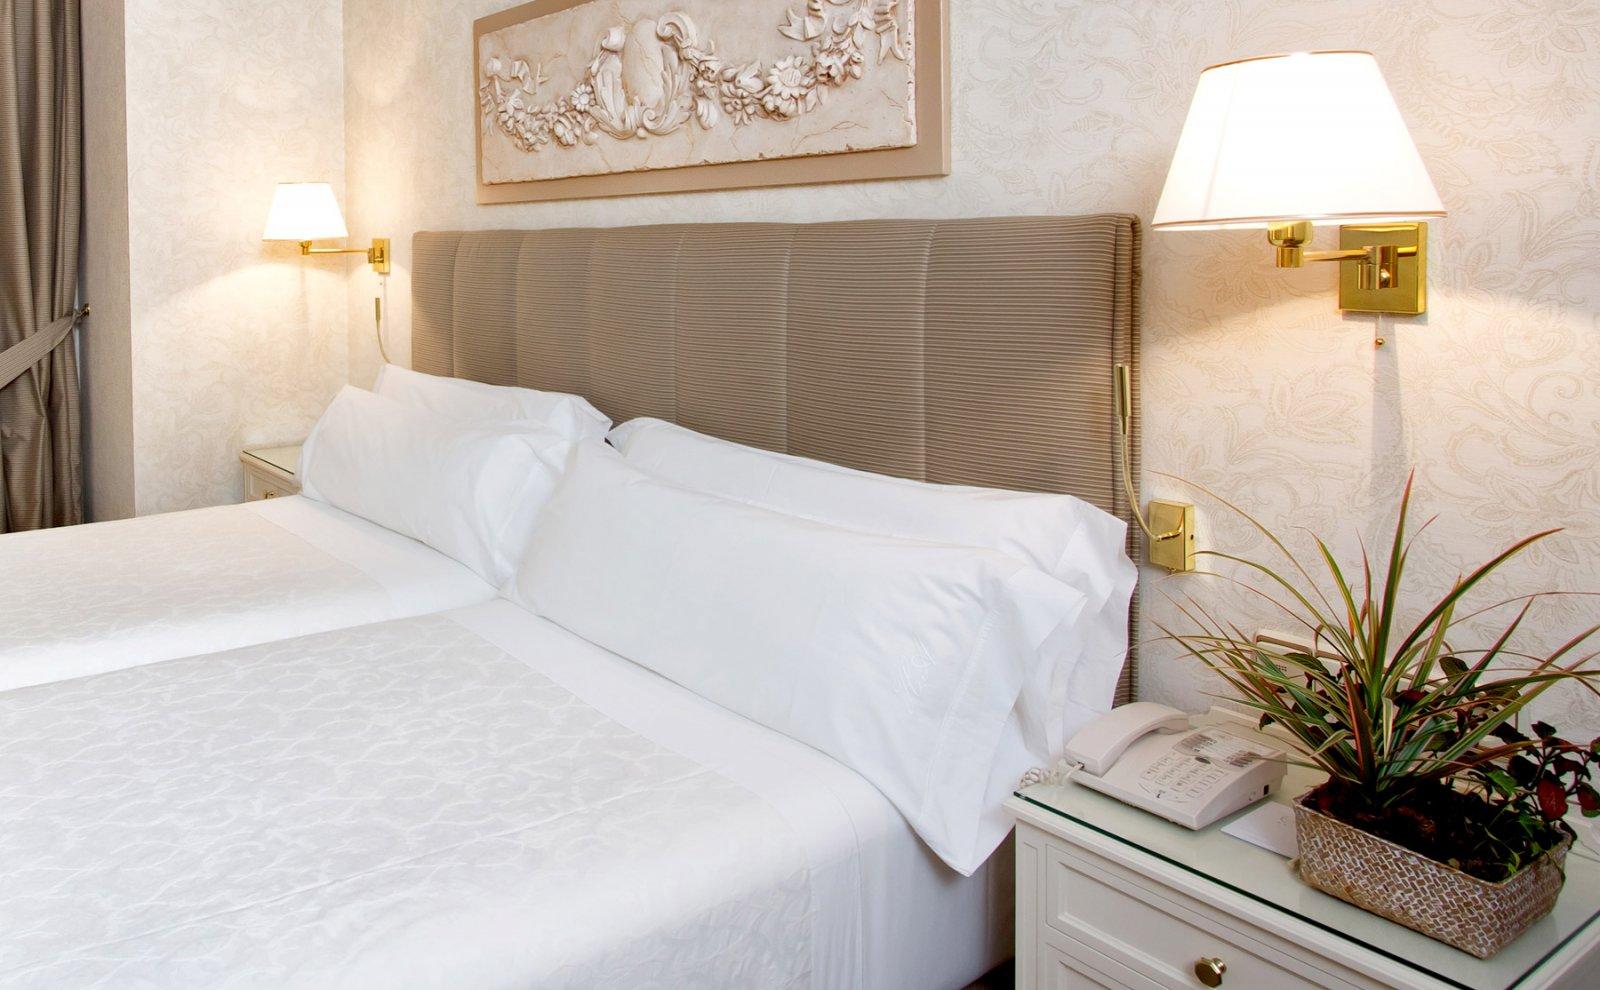 Luxury Hotel In Madrid Center 4 Star Hotel Atlantico Madrid